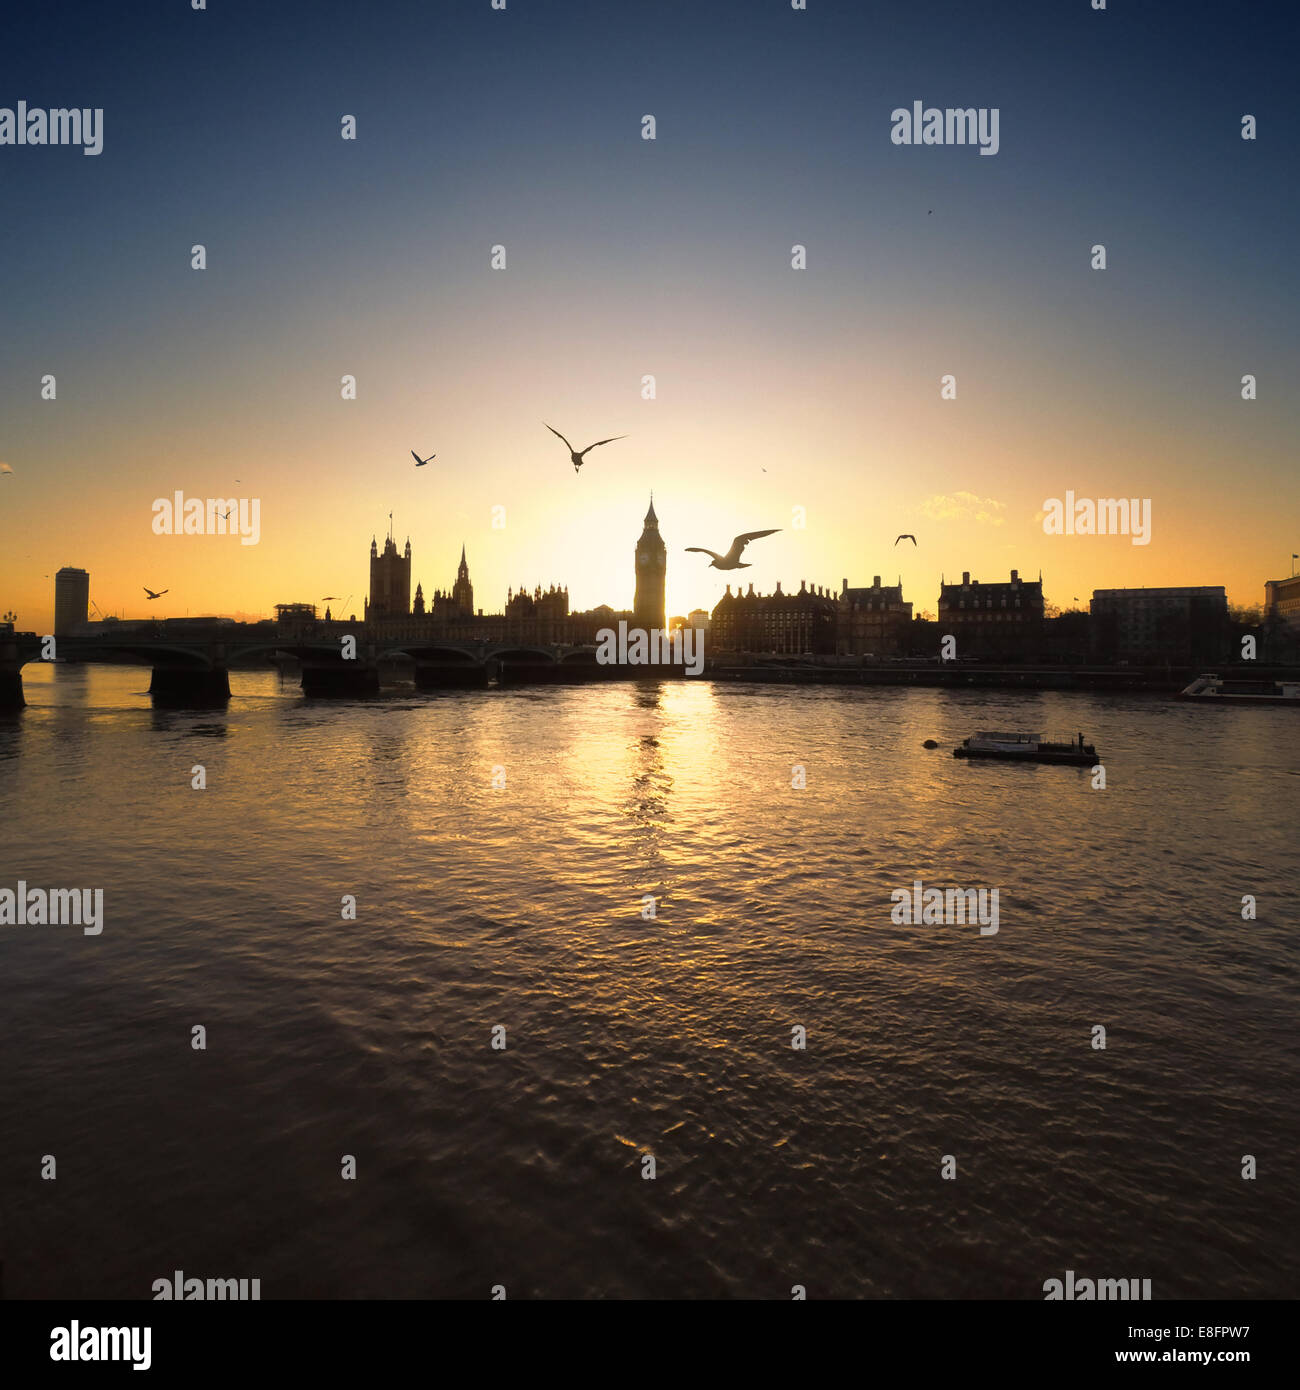 United Kingdom, London, Palace of Westminster at sunset - Stock Image